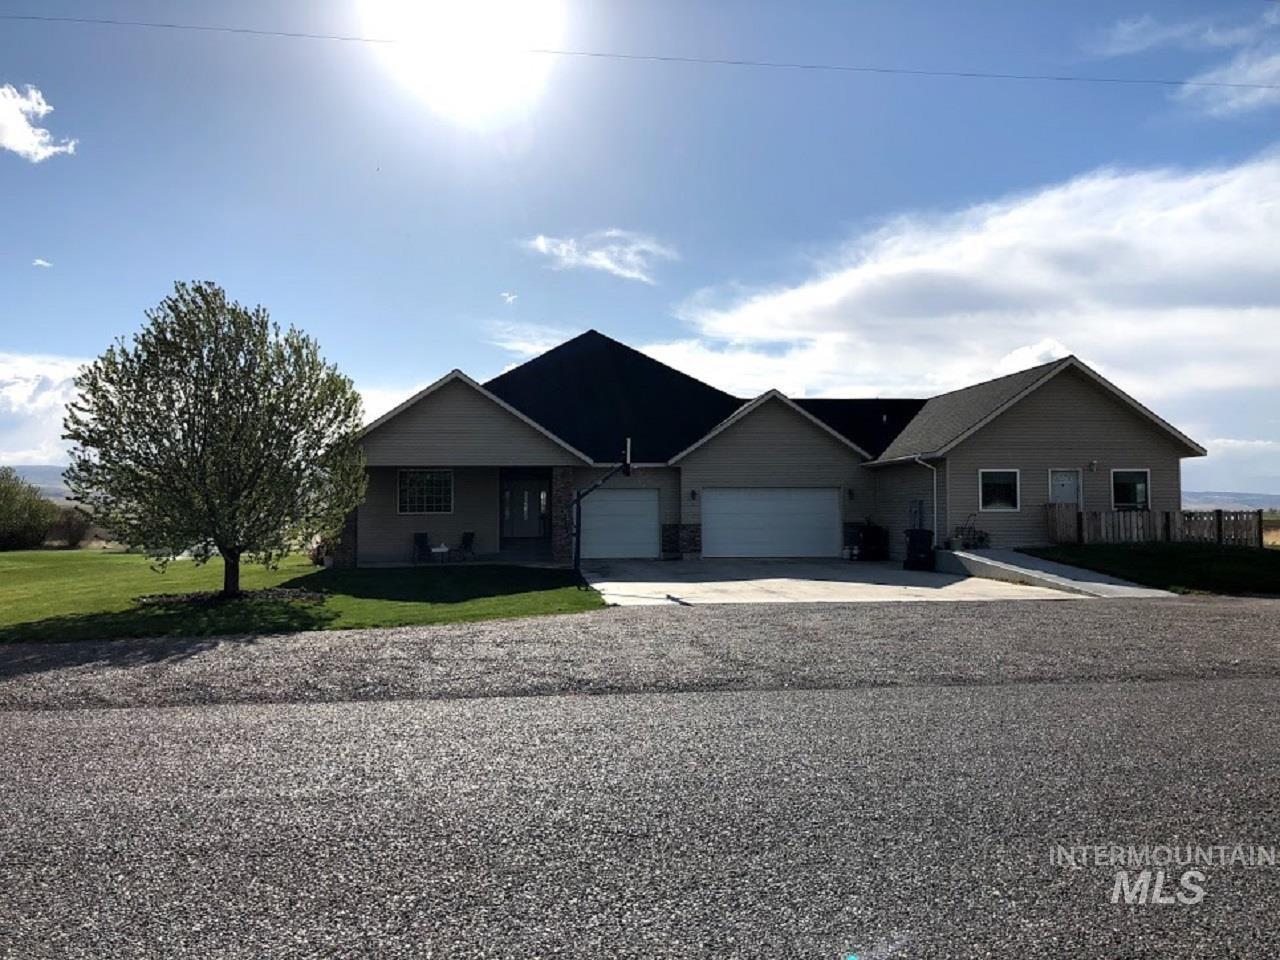 435 S College Property Photo 1